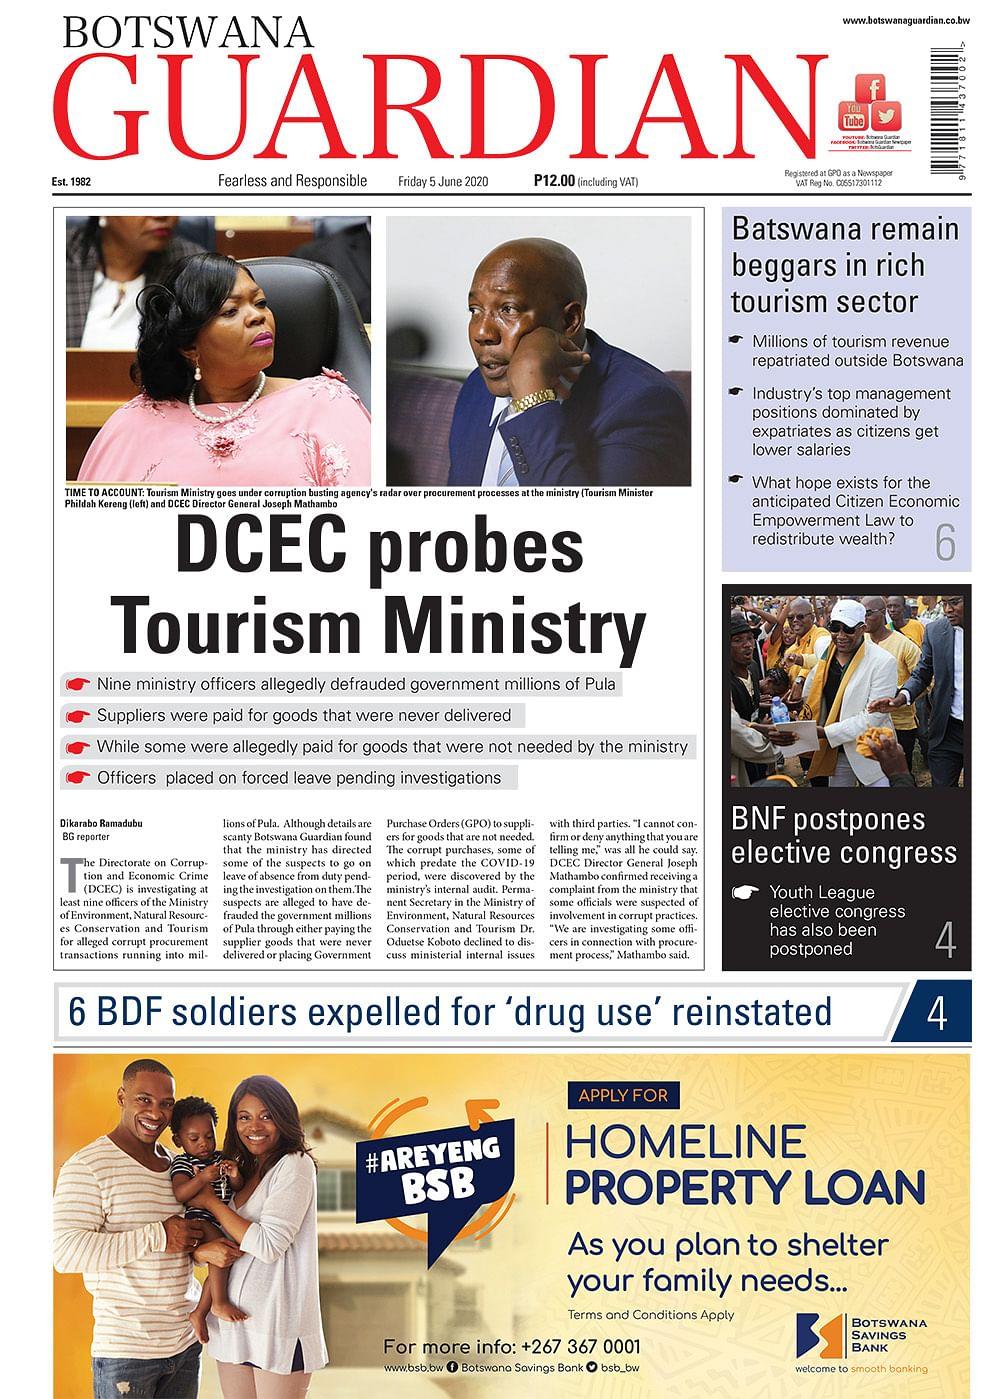 Botswana Guardian 4.6.2020